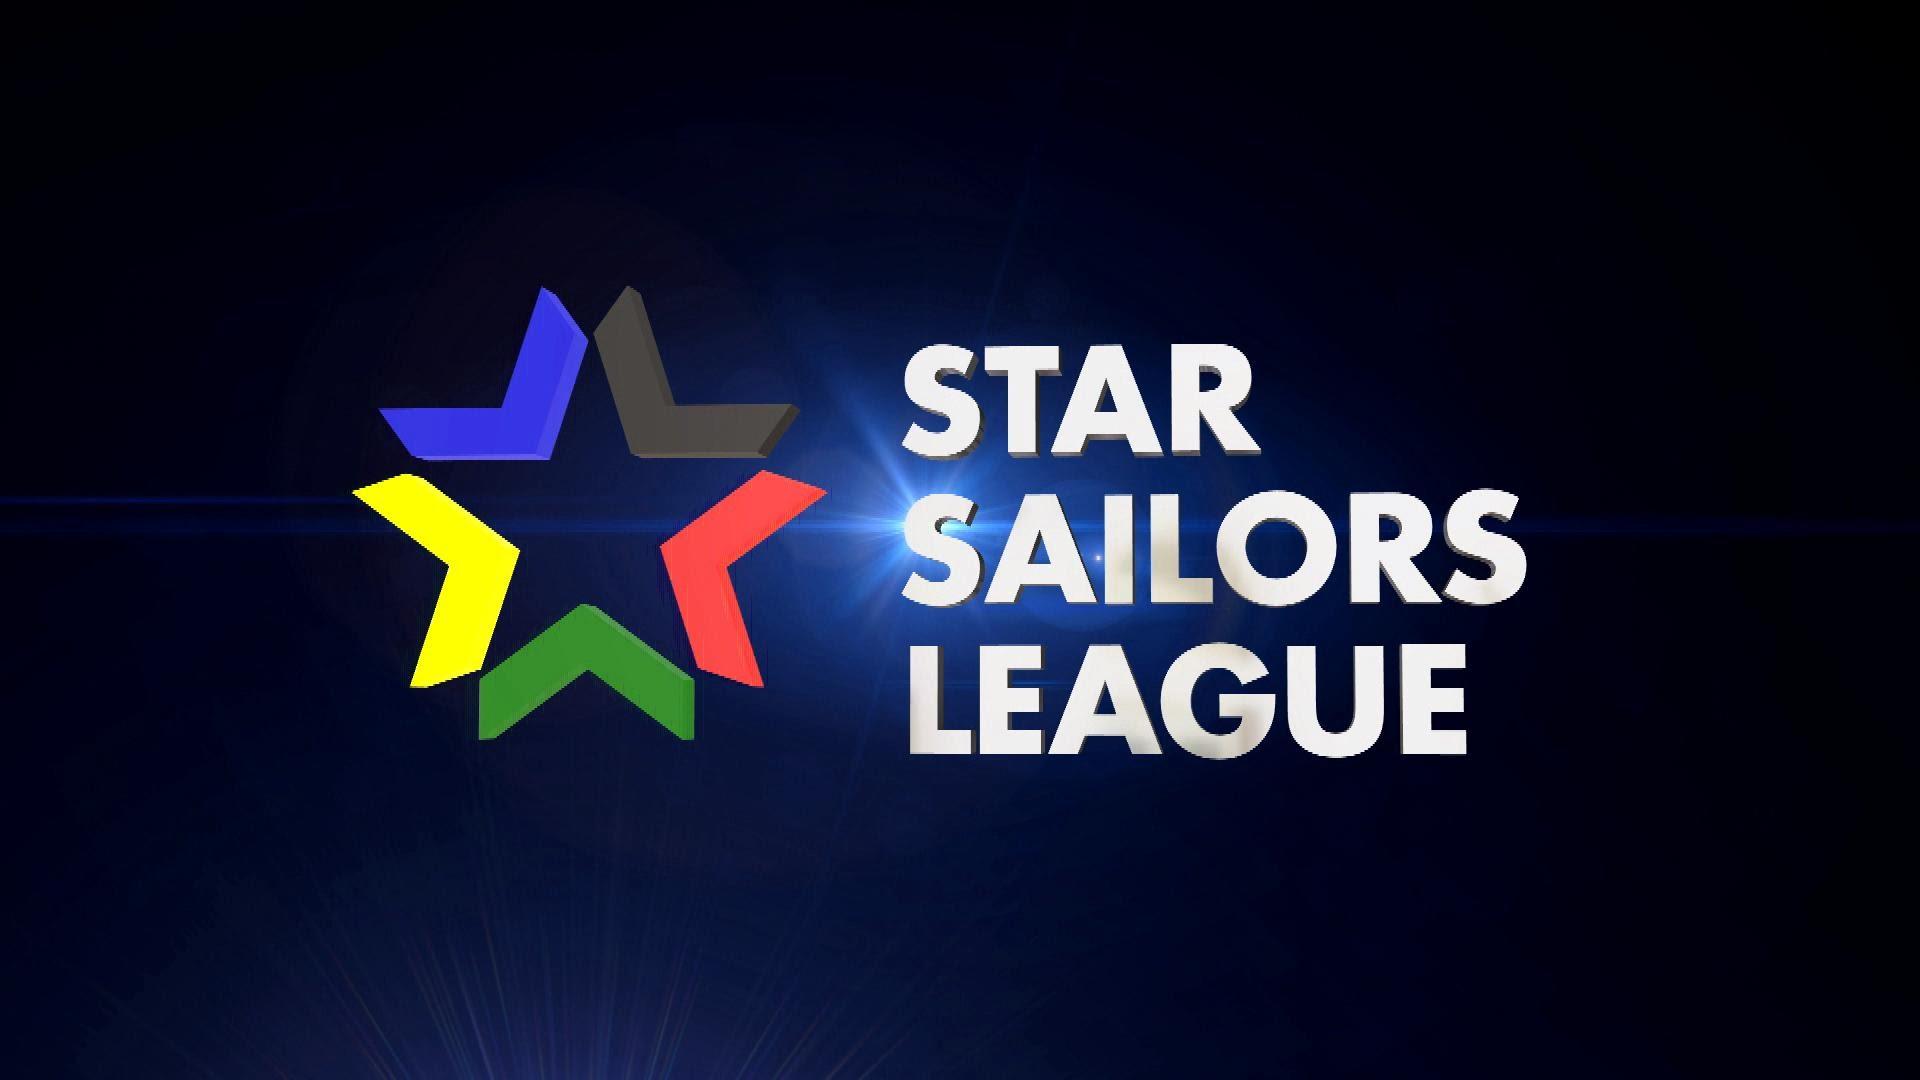 Sport : Stars Sailors League - Race 8 Day 3